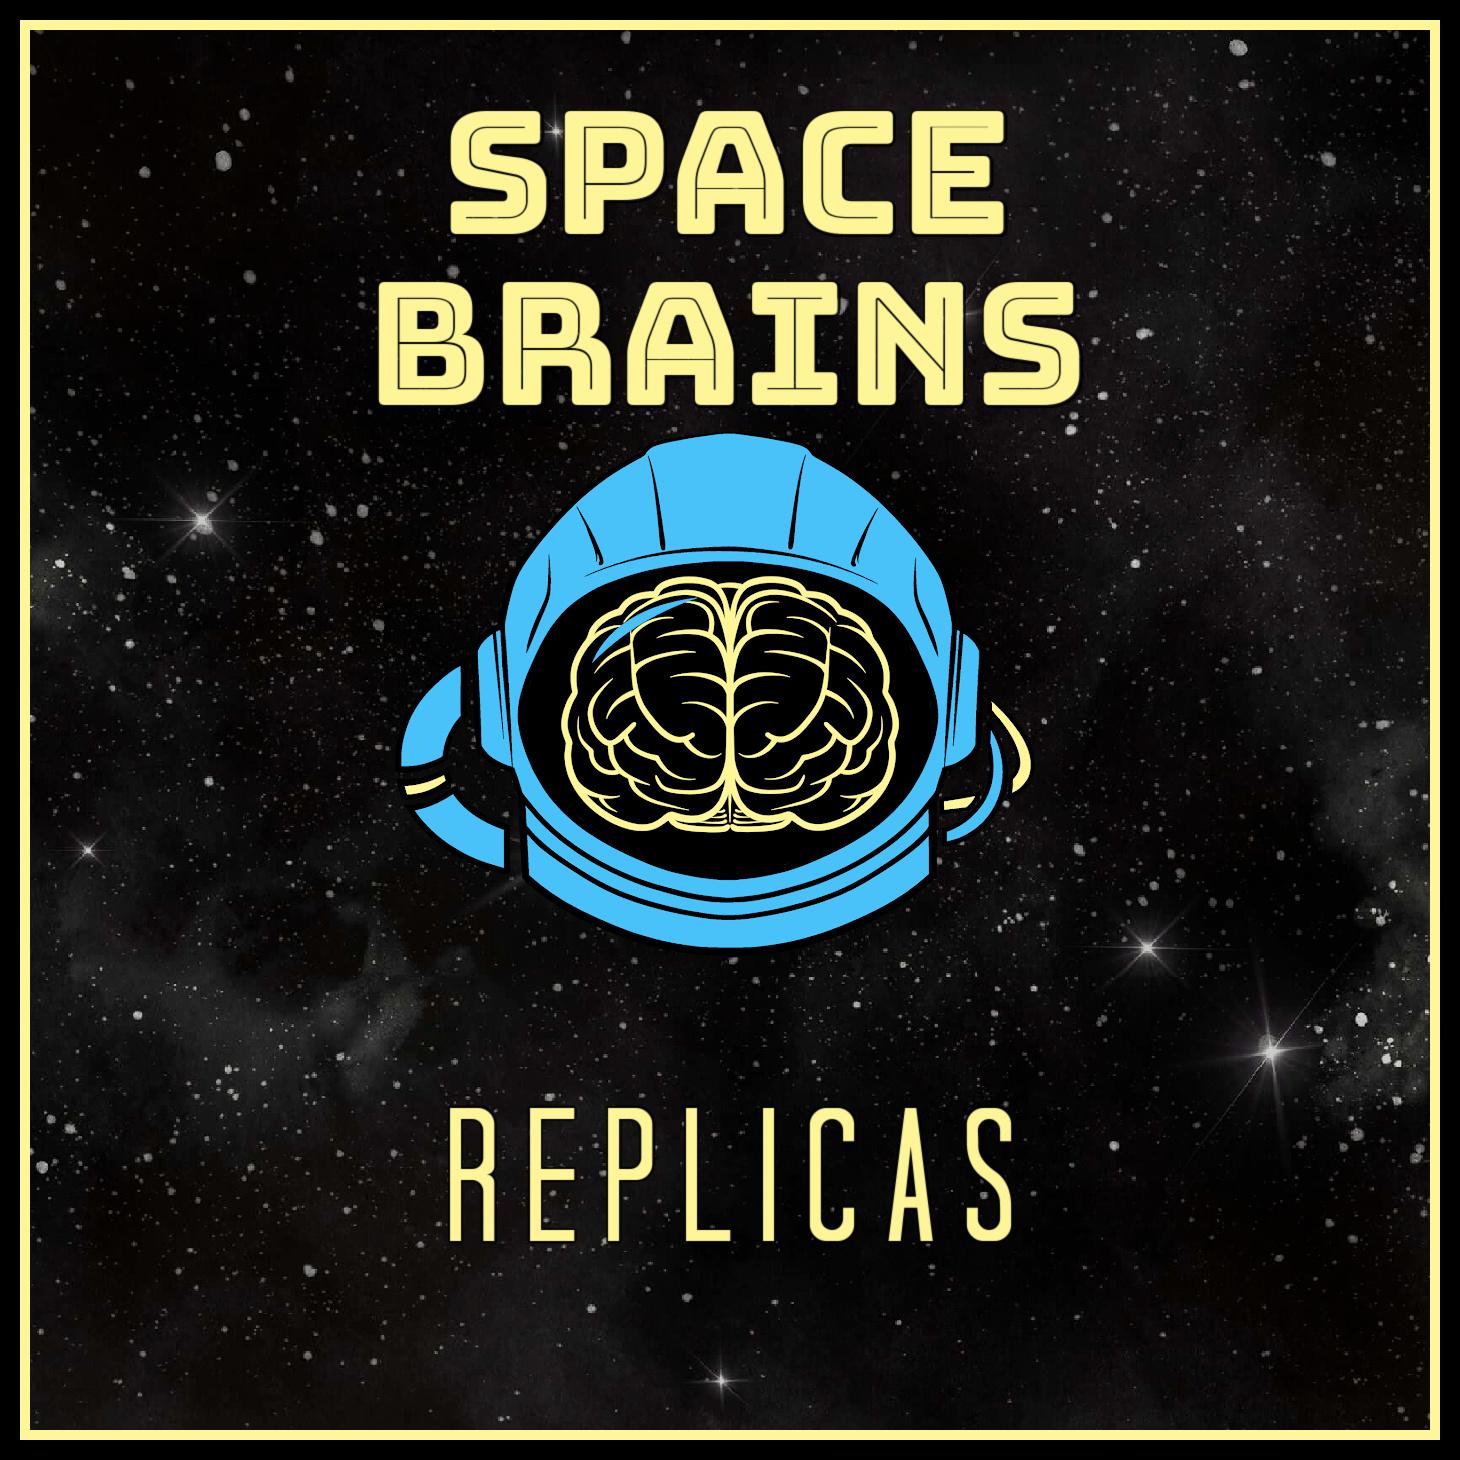 Space Brains - 44 - Replicas